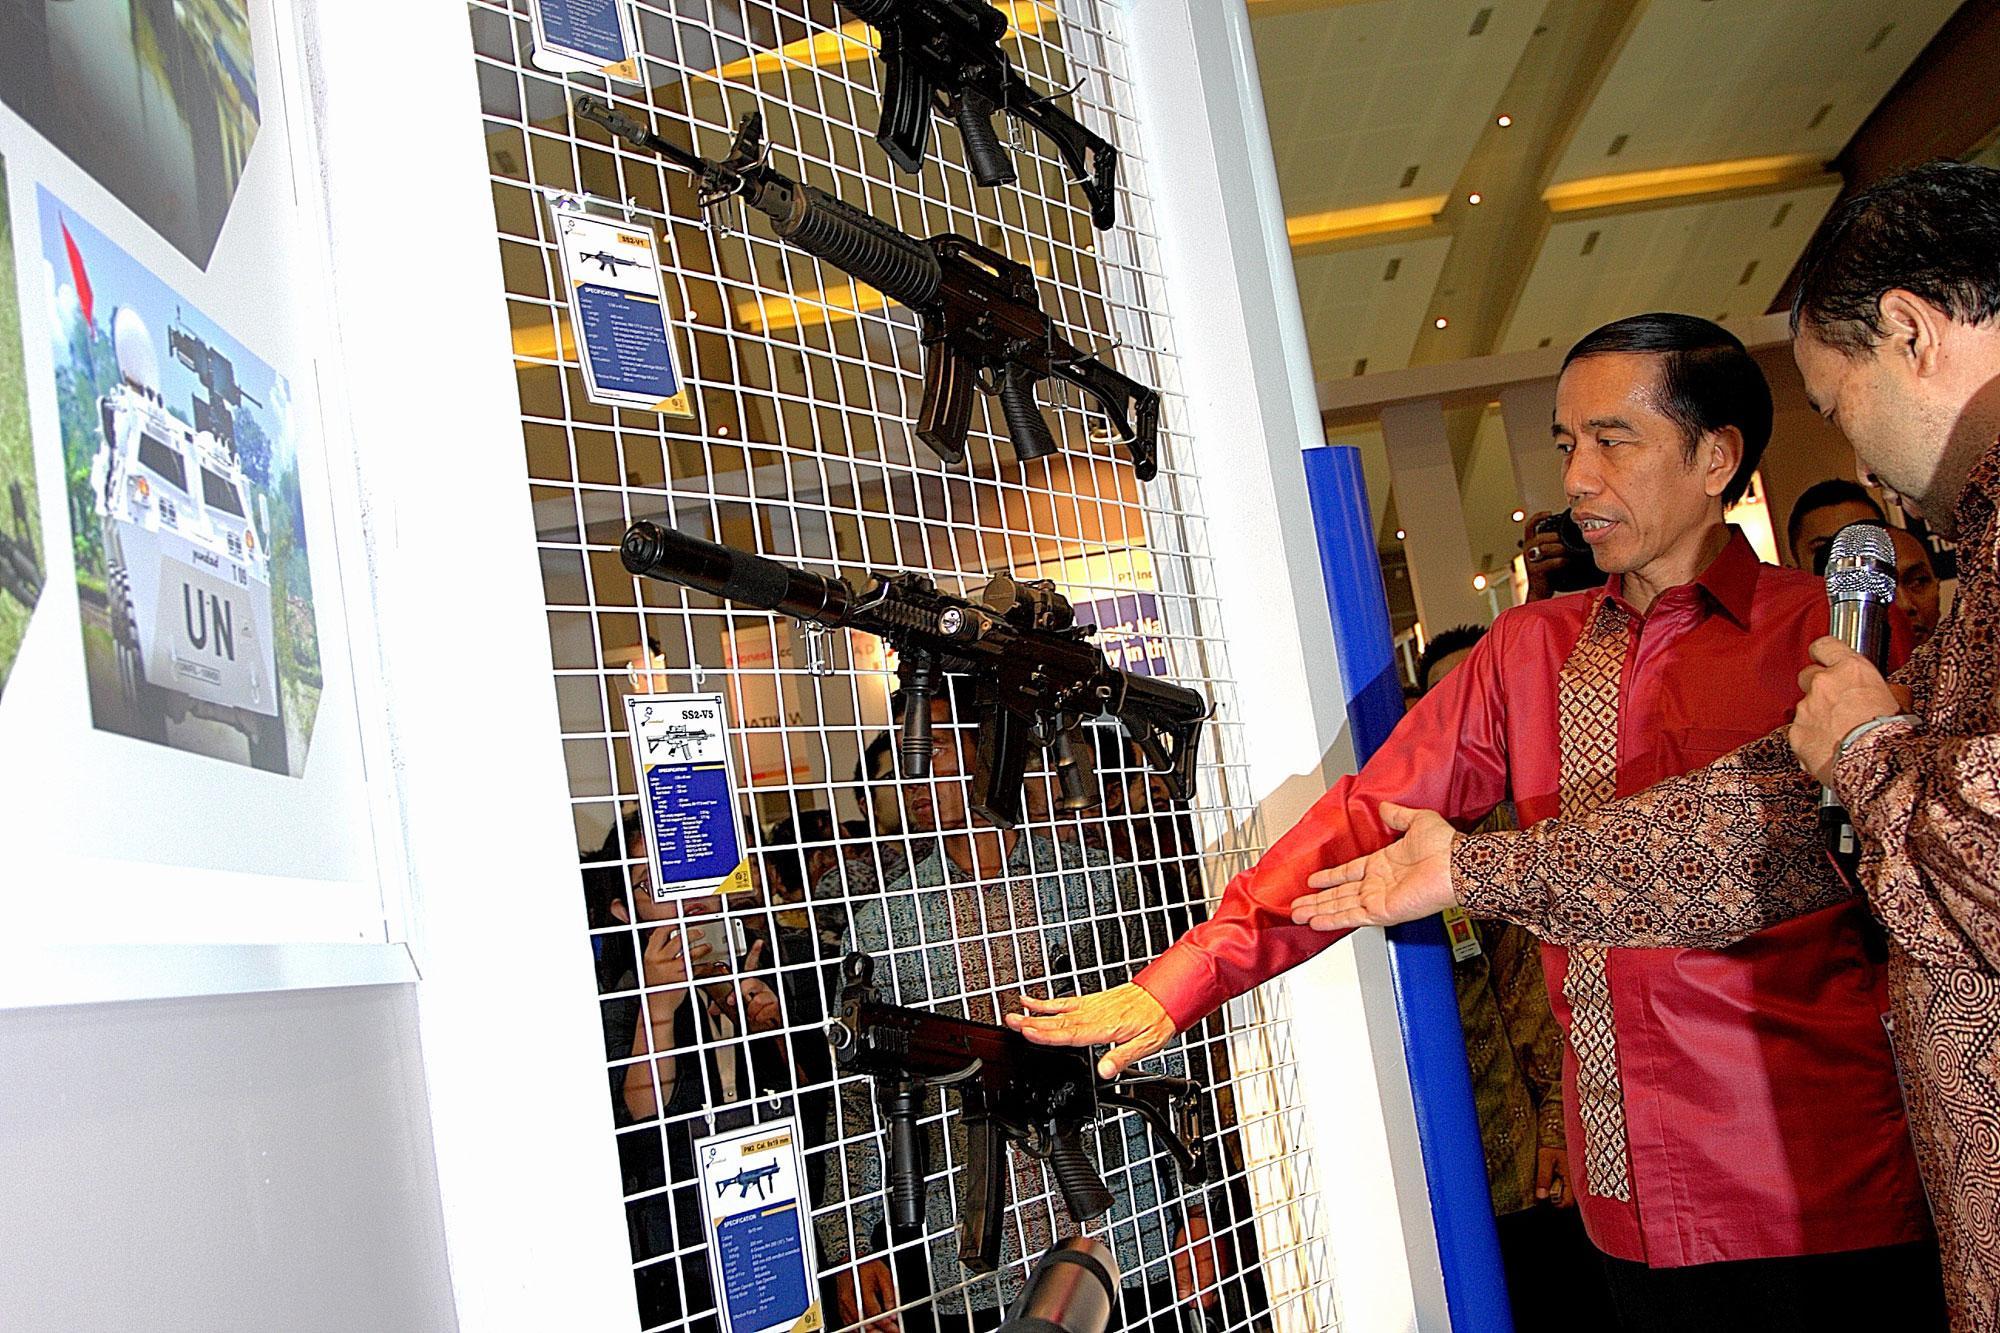 Presiden Joko Widodo mengamati senapan serbu produksi PT Pindad (Persero) ketika mengunjungi pameran Trade Expo Indonesia ke-30 Tahun 2015 di Arena Pekan Raya Jakarta, Kemayoran, Jakarta, Rabu (21/10).